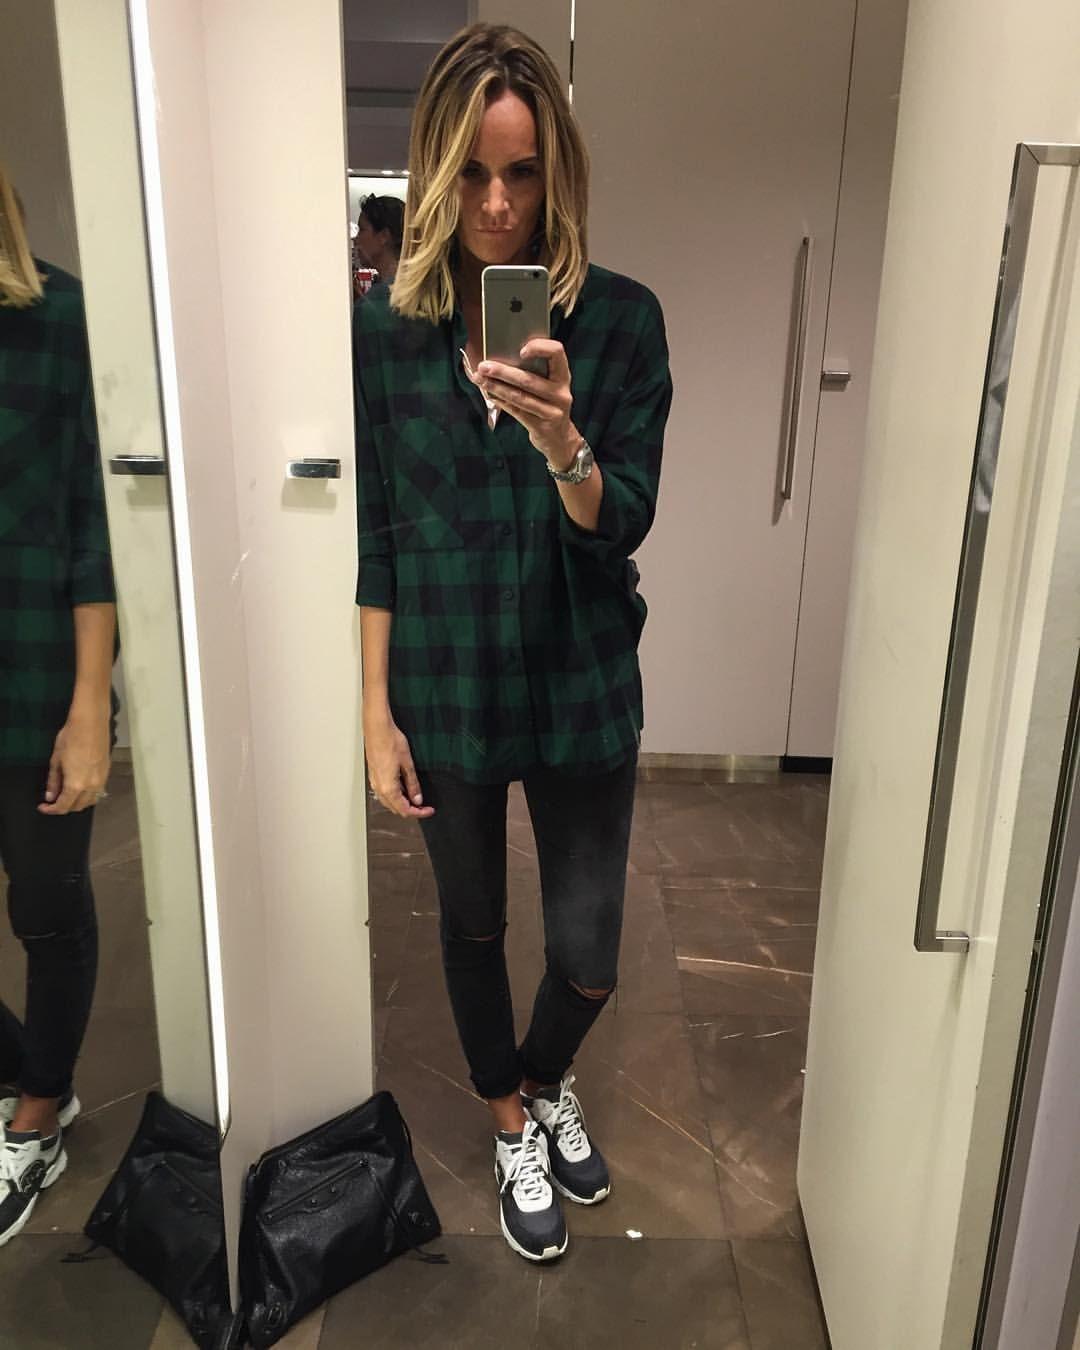 Katialola On Instagram About Yesterday Short Stop Zara Zaraisalwaysagoodidea Zara Dubai Dubaimall Shopping Womens Fashion Inspiration Zara Fashion